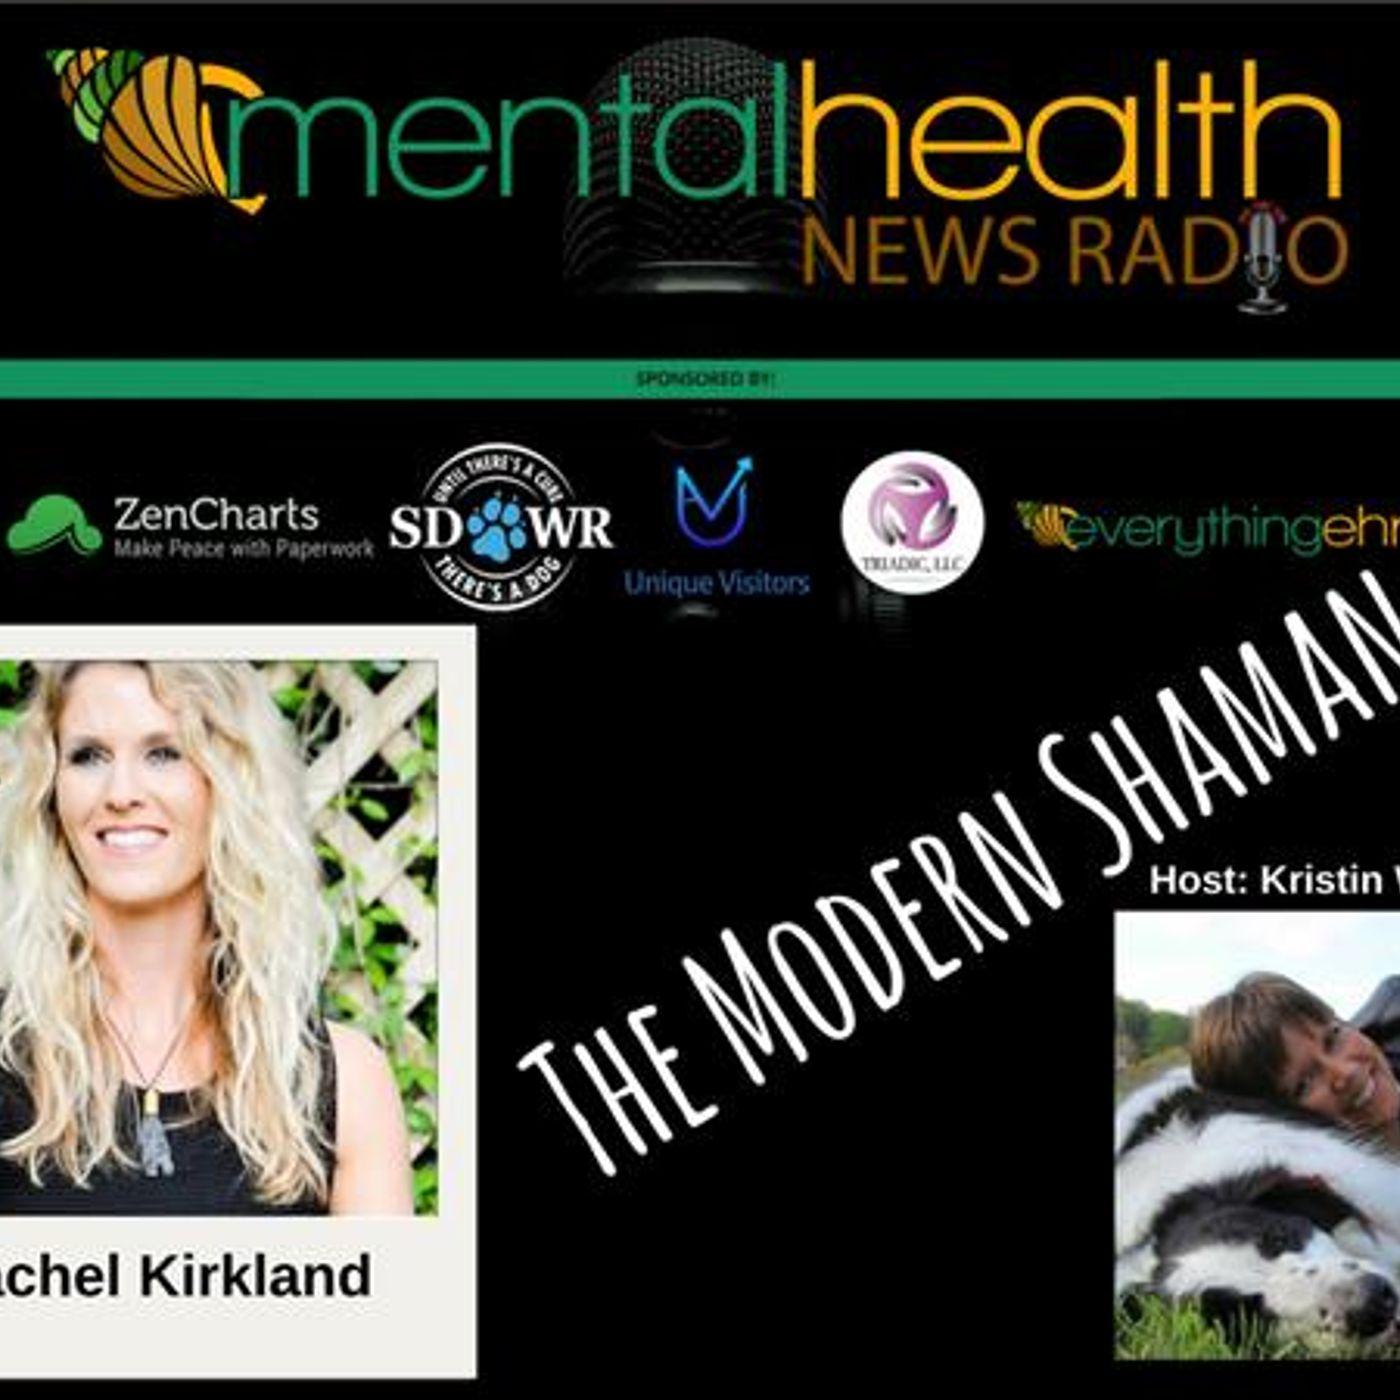 Mental Health News Radio - The Modern Shaman with Rachel Kirkland